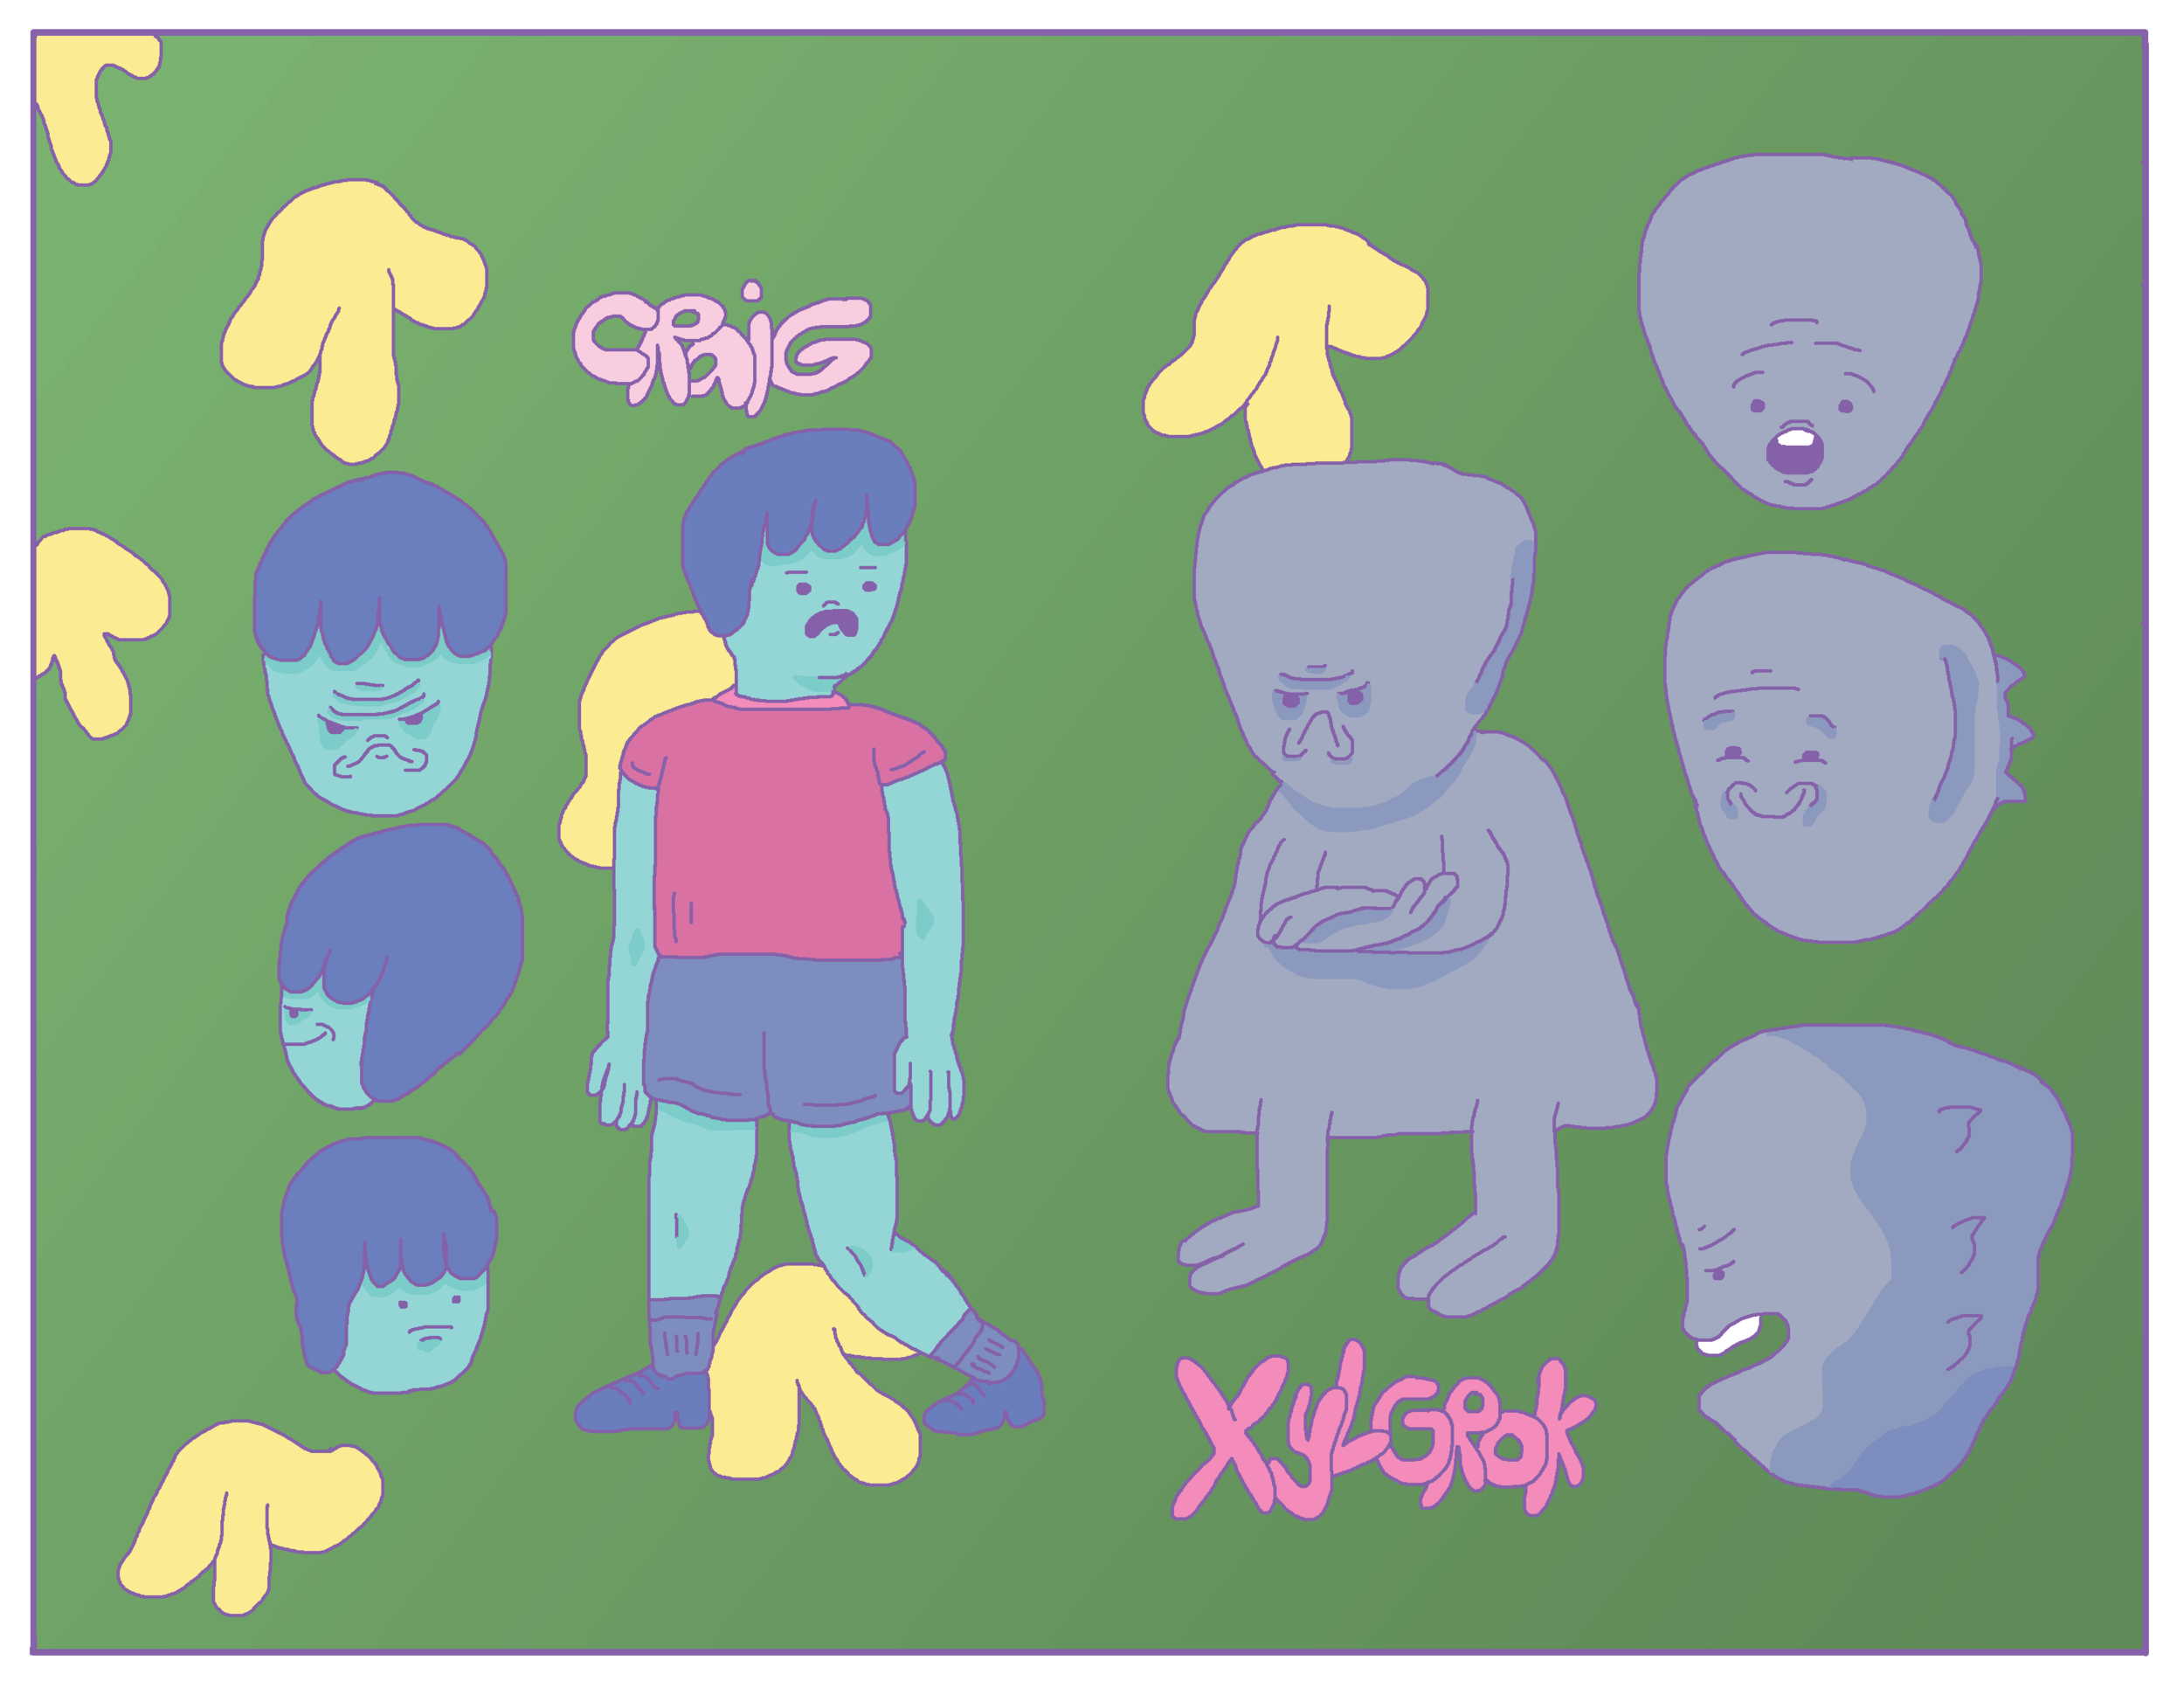 CNS character sheet 2.png